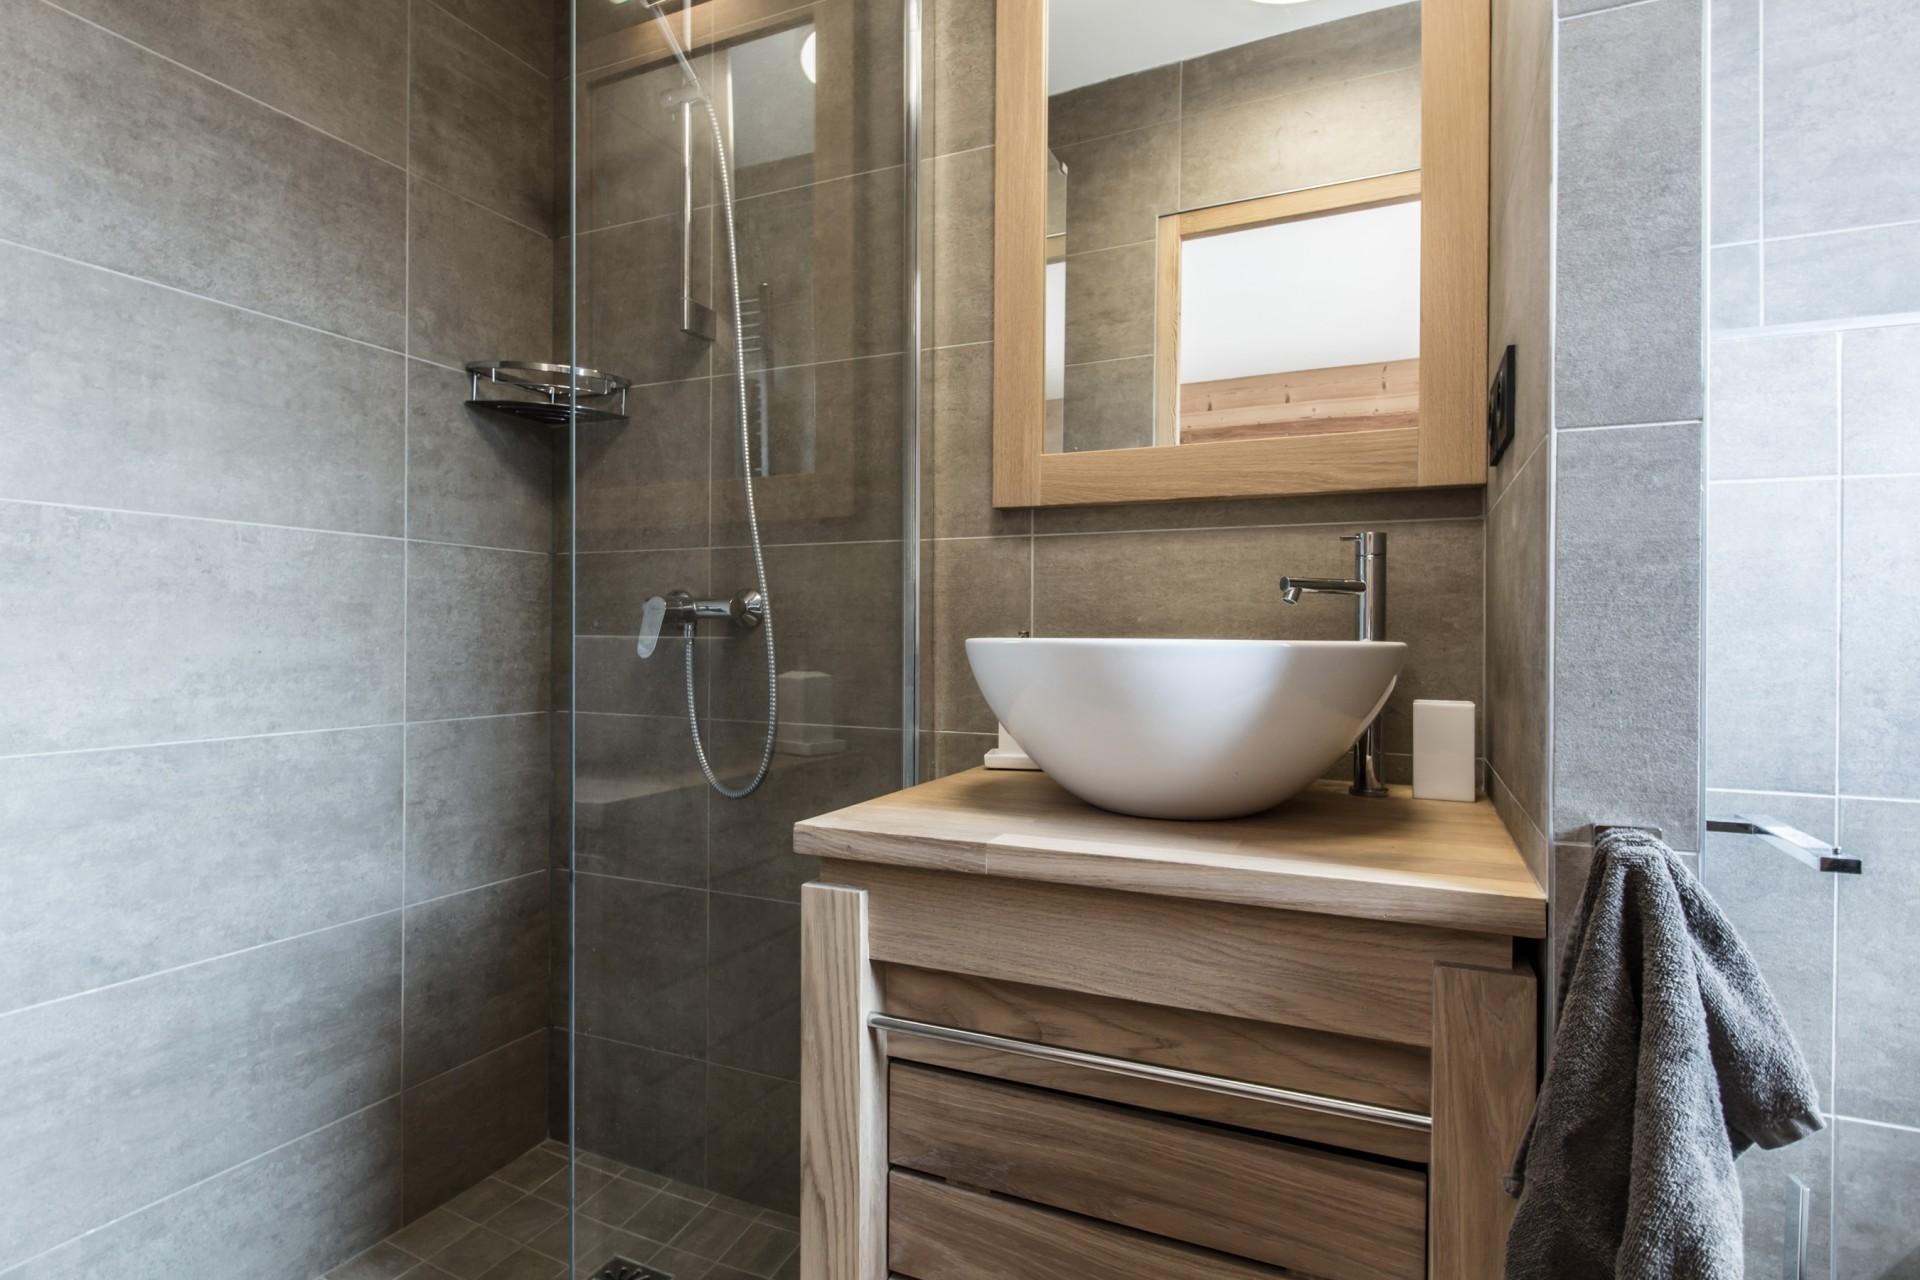 Les Gets Luxury Rental Chalet Ancalie Bathroom